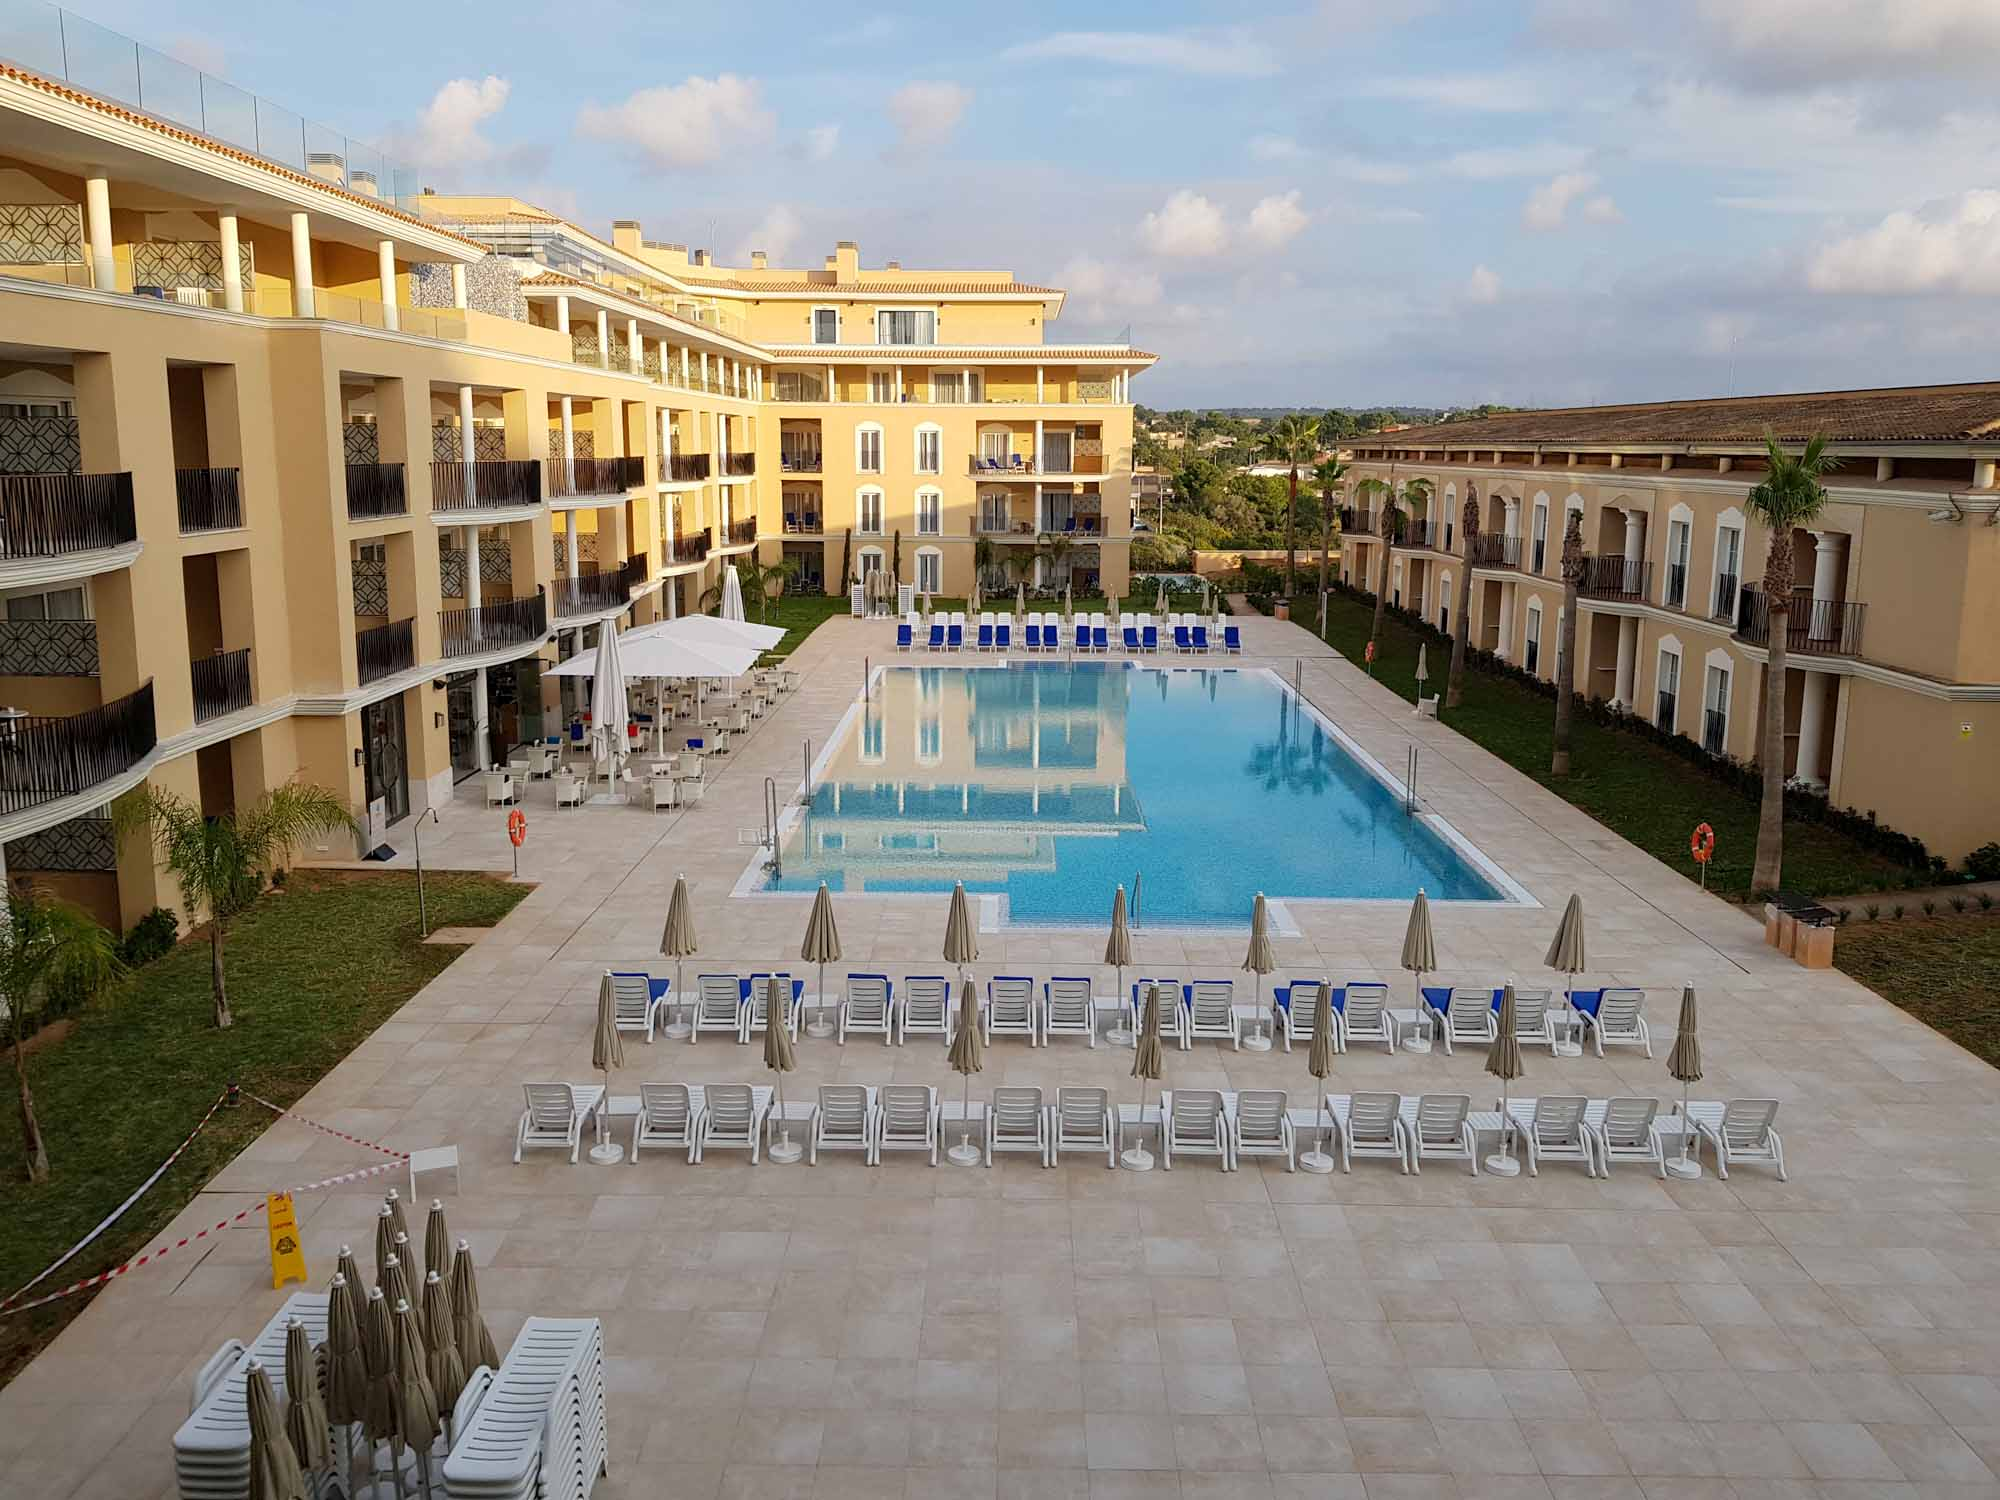 Das Grupotel Playa de Palma Prestige Suites & Spa. Ein erst im Frühjahr 2019 fertiggestellter Neubau mit Pool auf dem Dach / Foto: Ingo Paszkowsky